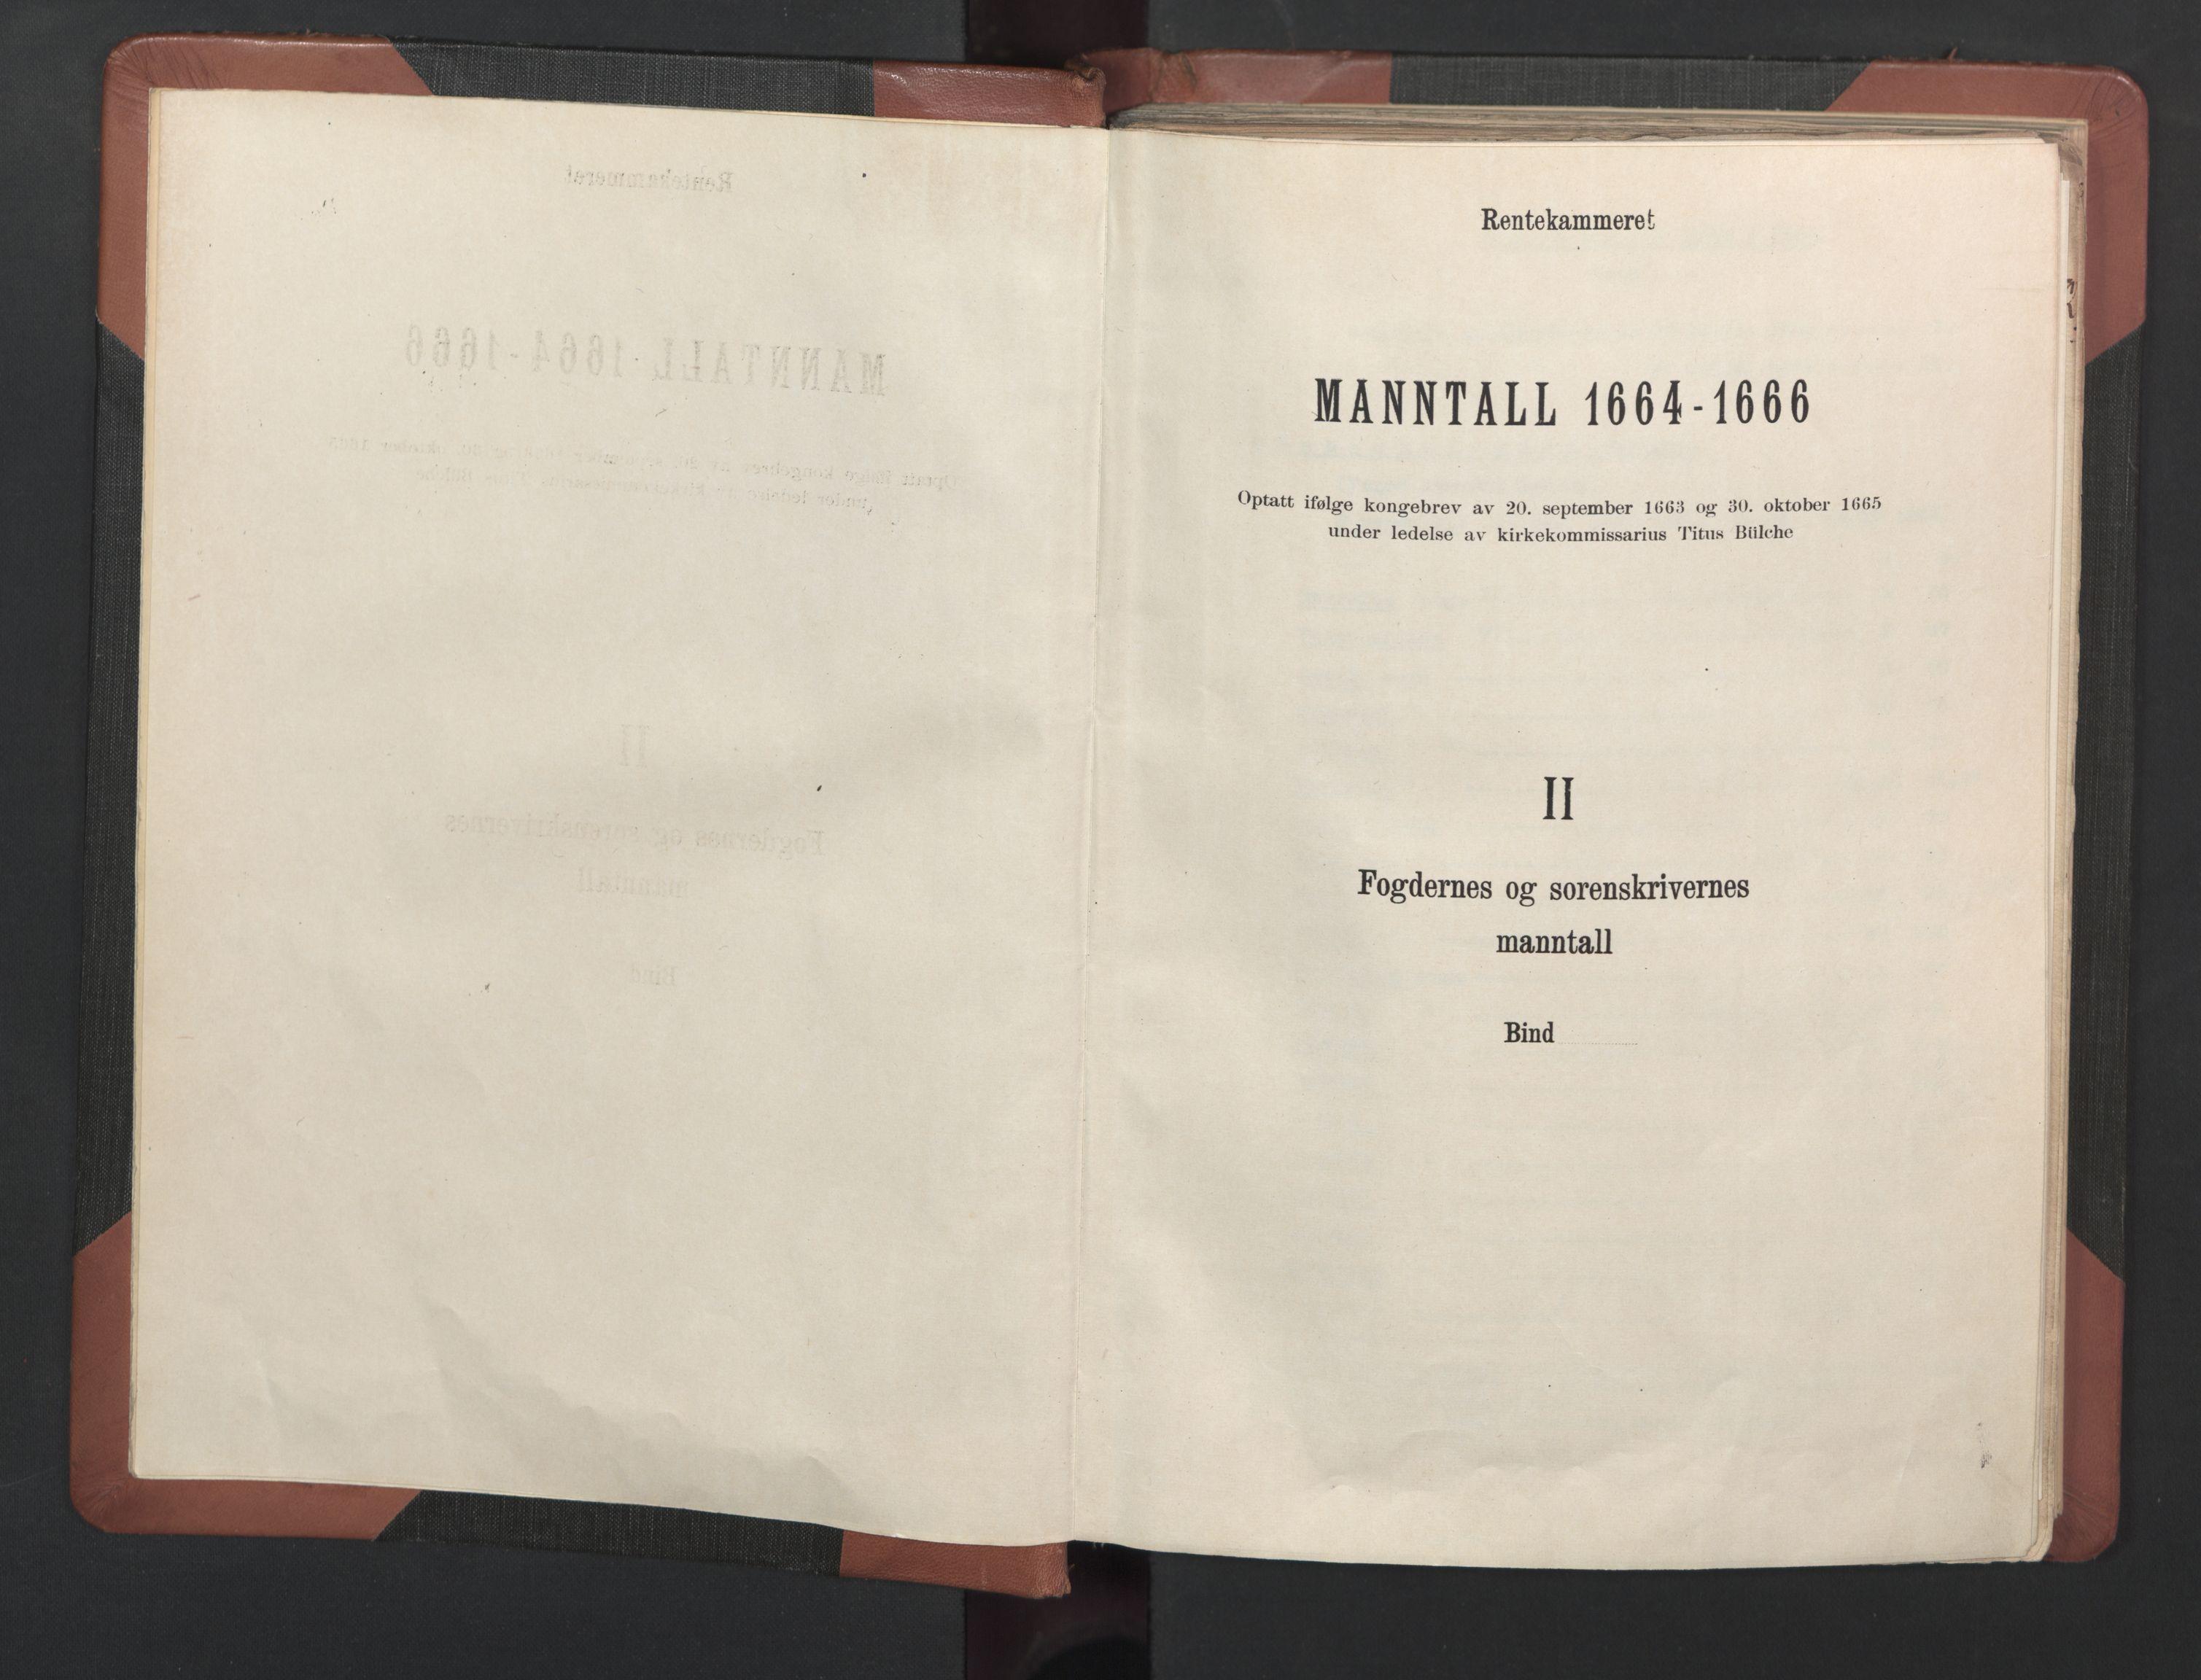 RA, Fogdenes og sorenskrivernes manntall 1664-1666, nr. 8: Råbyggelaget fogderi, 1664-1665, s. upaginert